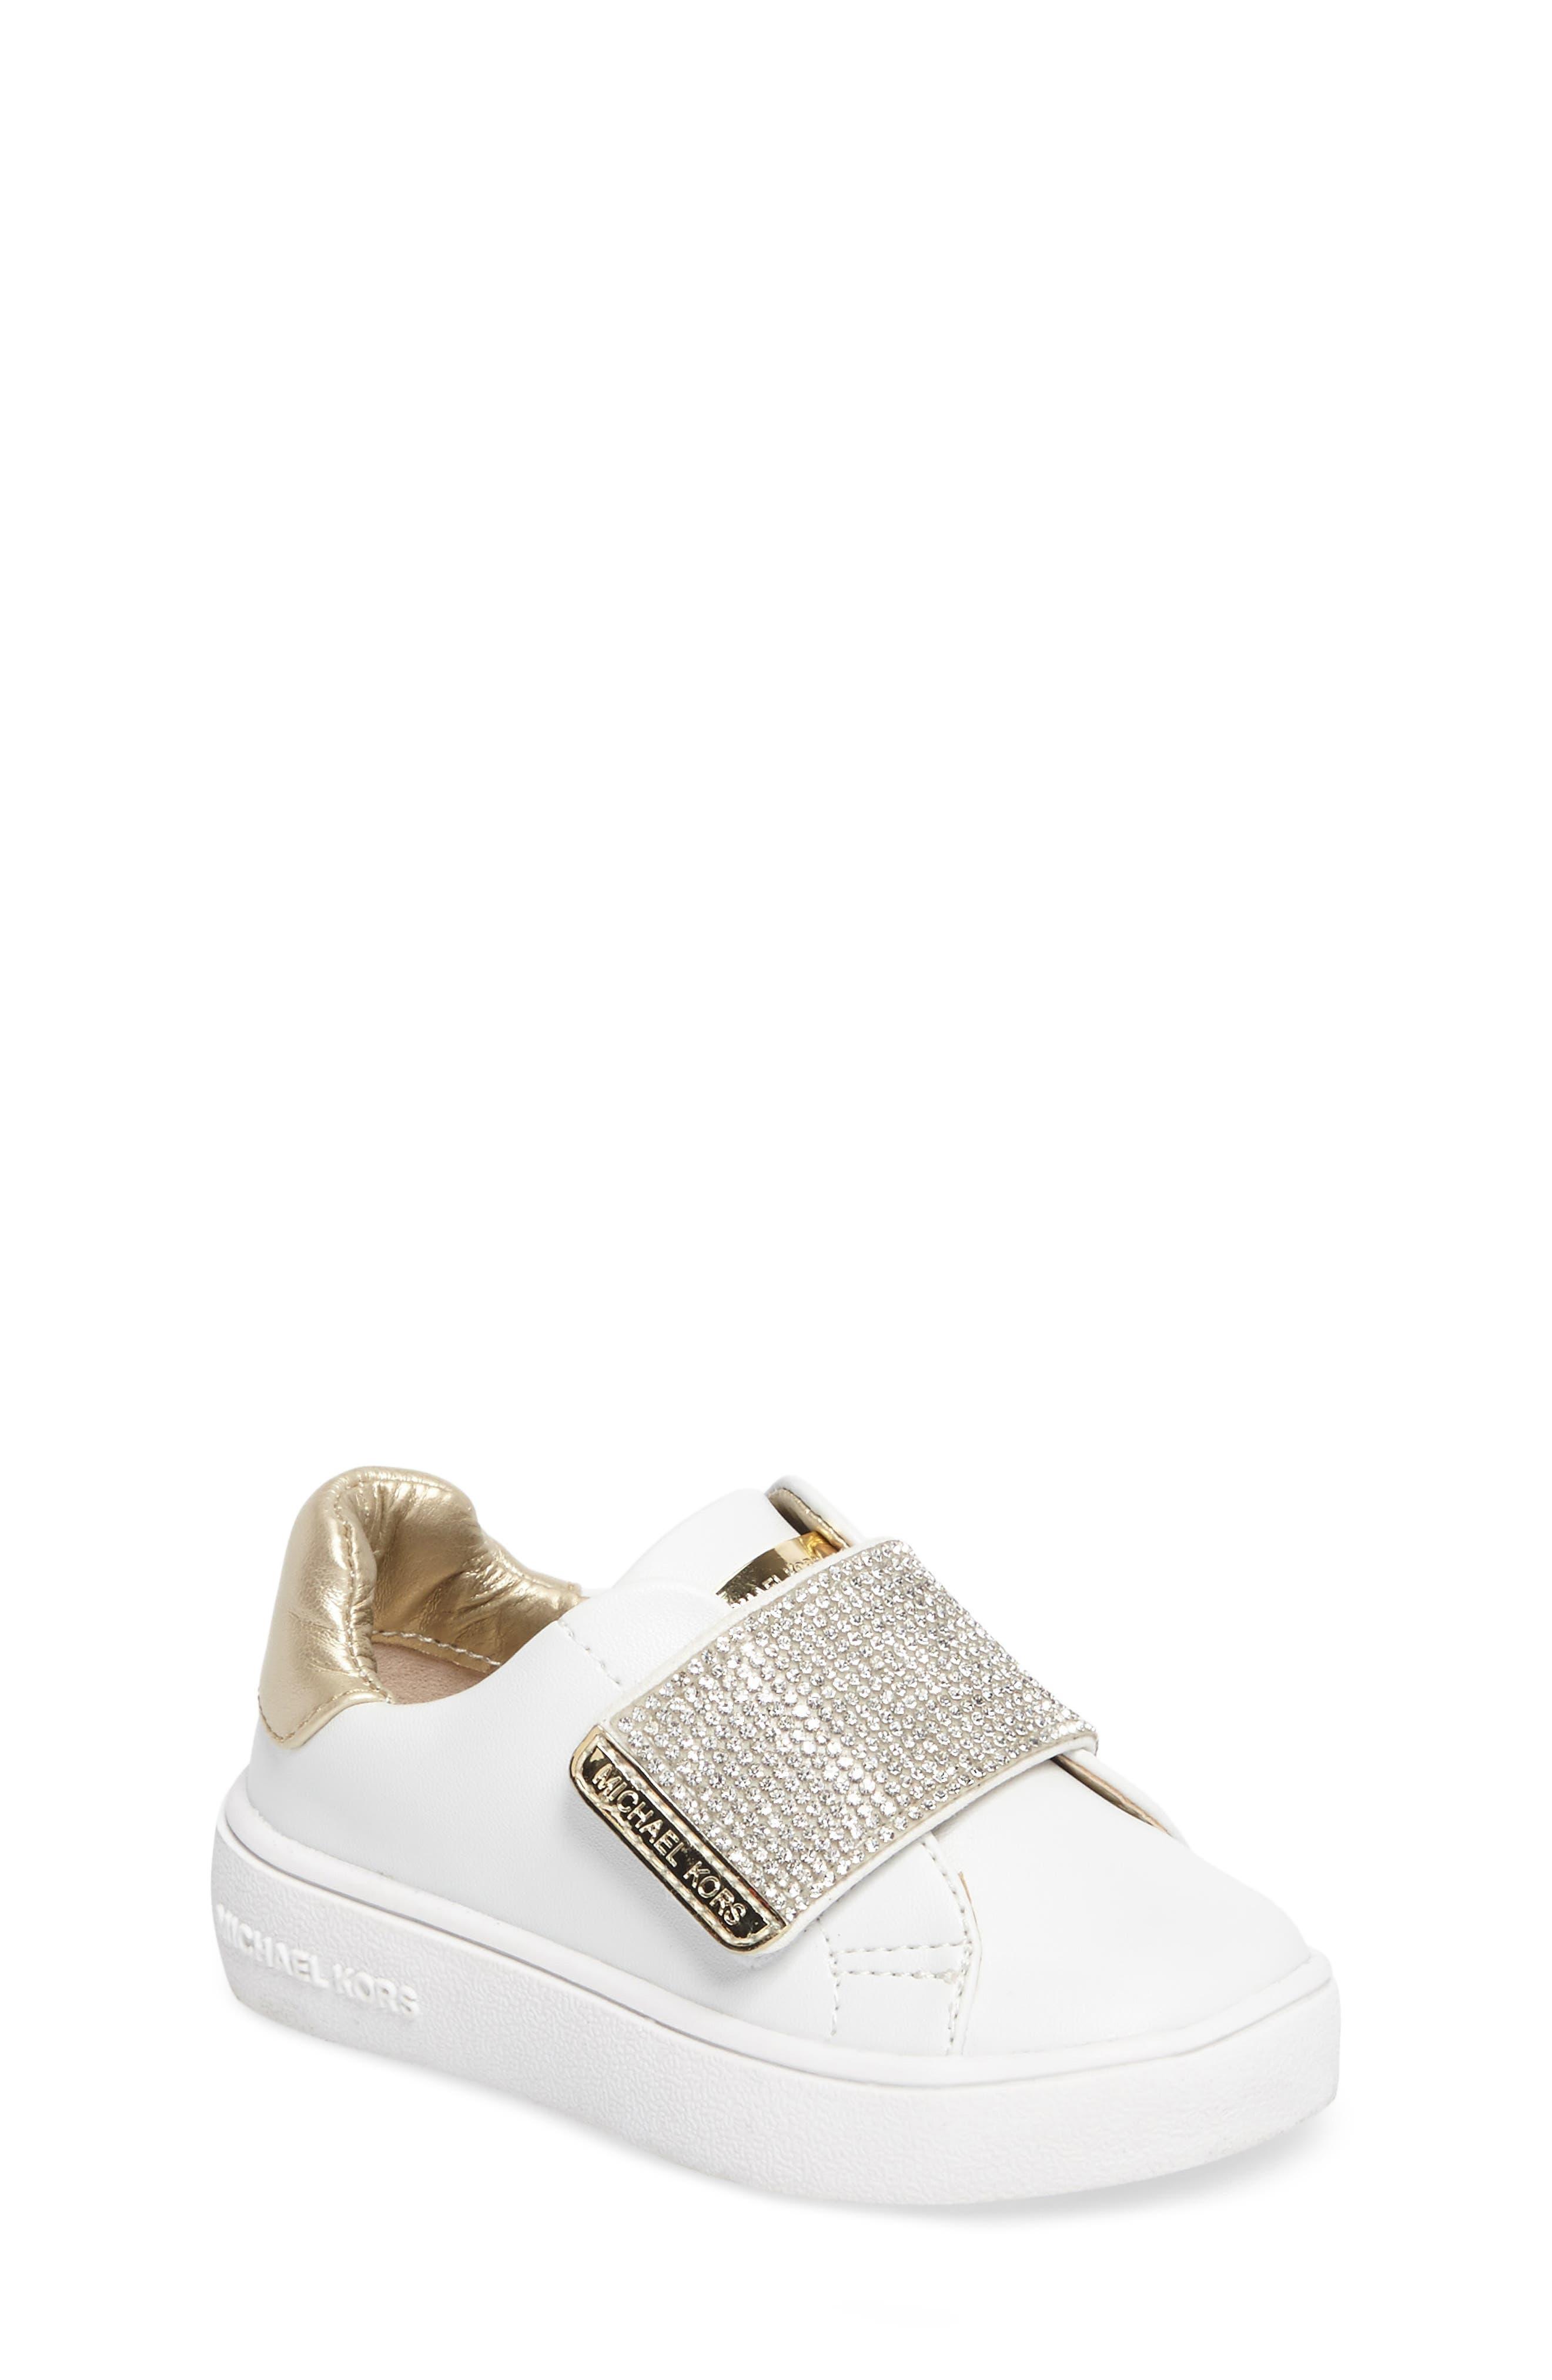 Main Image - MICHAEL Michael Kors Ivy Candy Sneaker (Walker, Toddler, Little Kid & Big Kid)